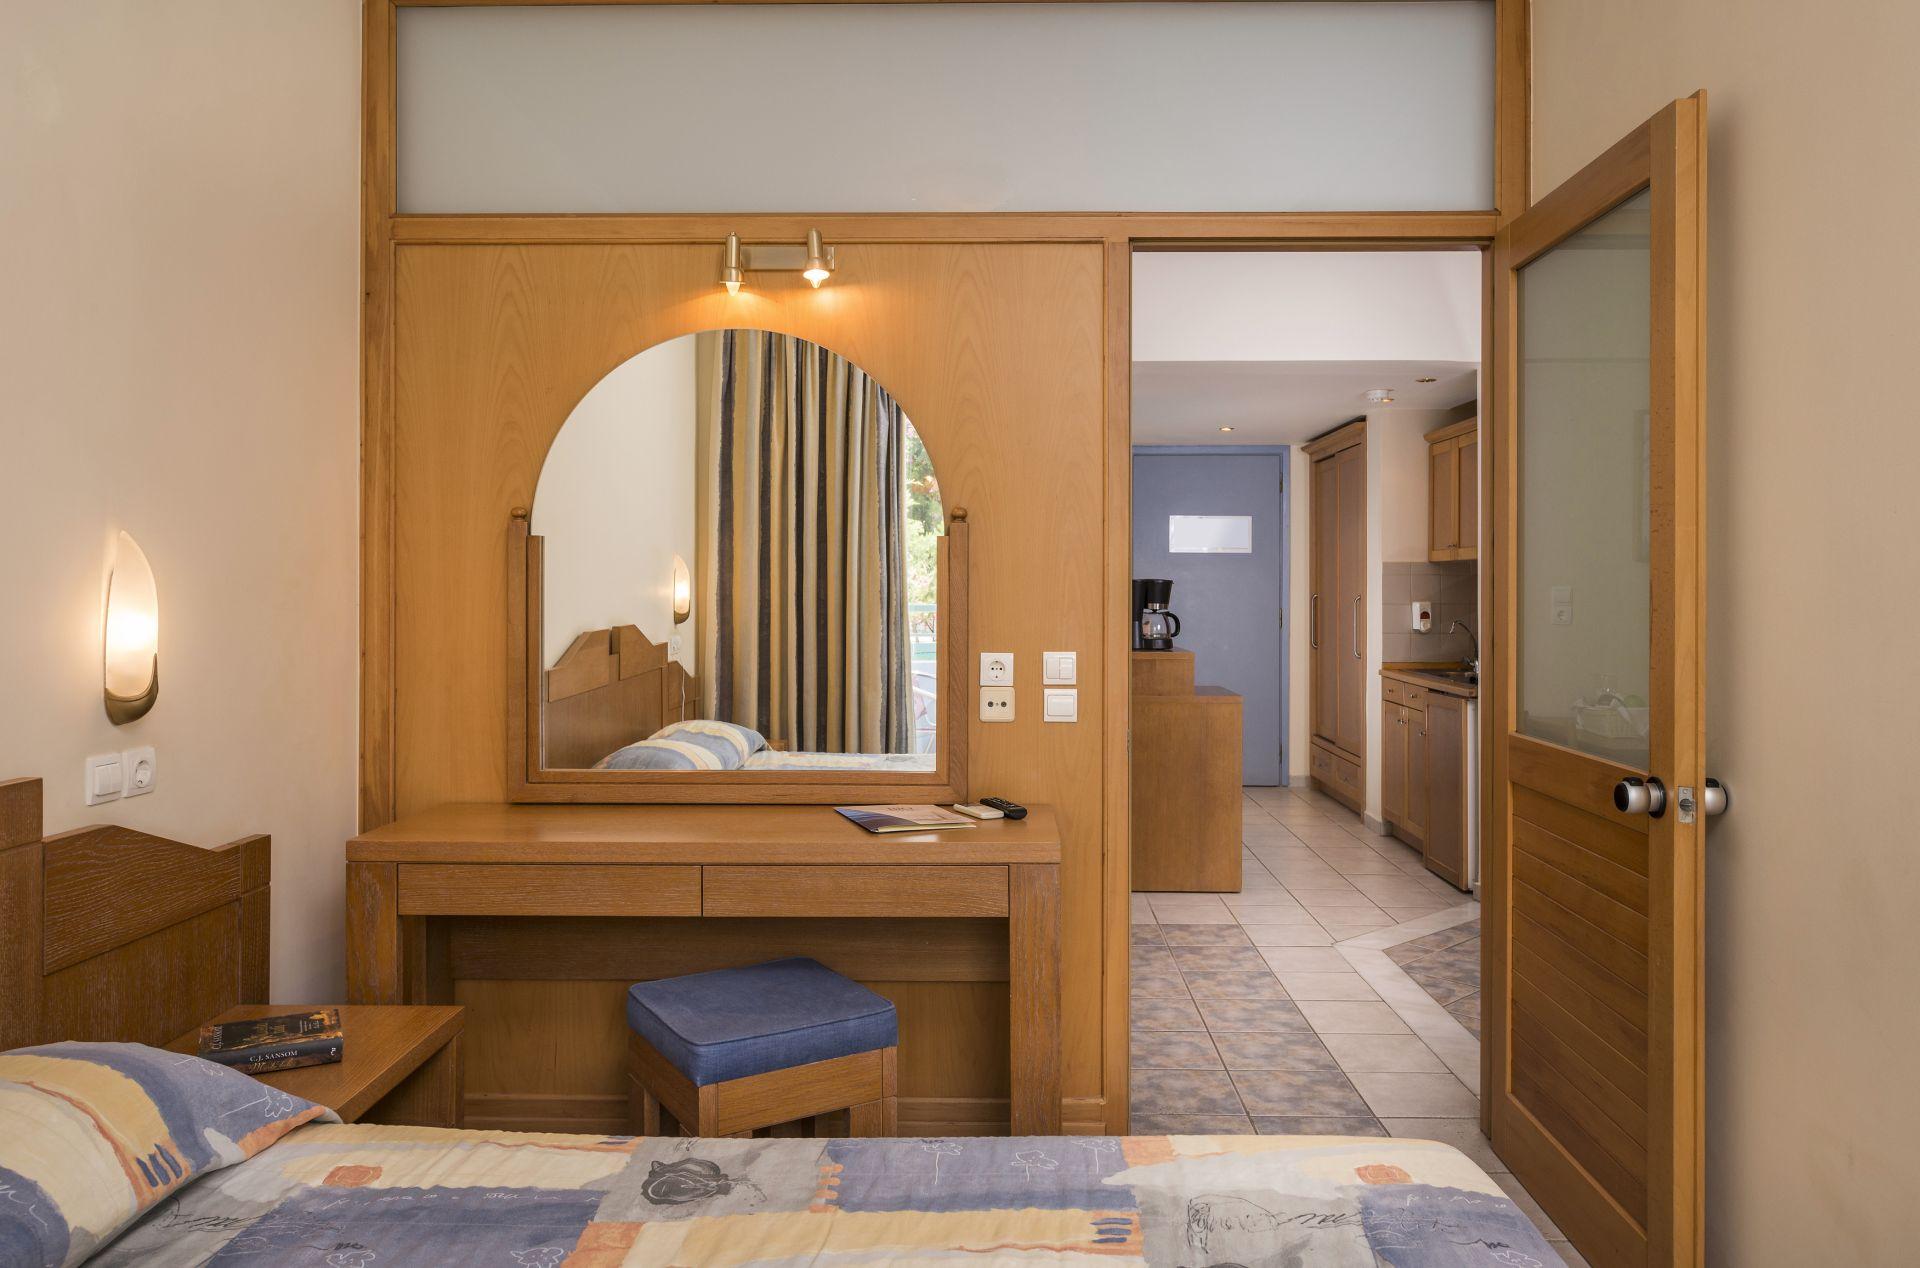 Leilighet med To Soverom - BIO Suites Hotel in Rethymnon, Crete